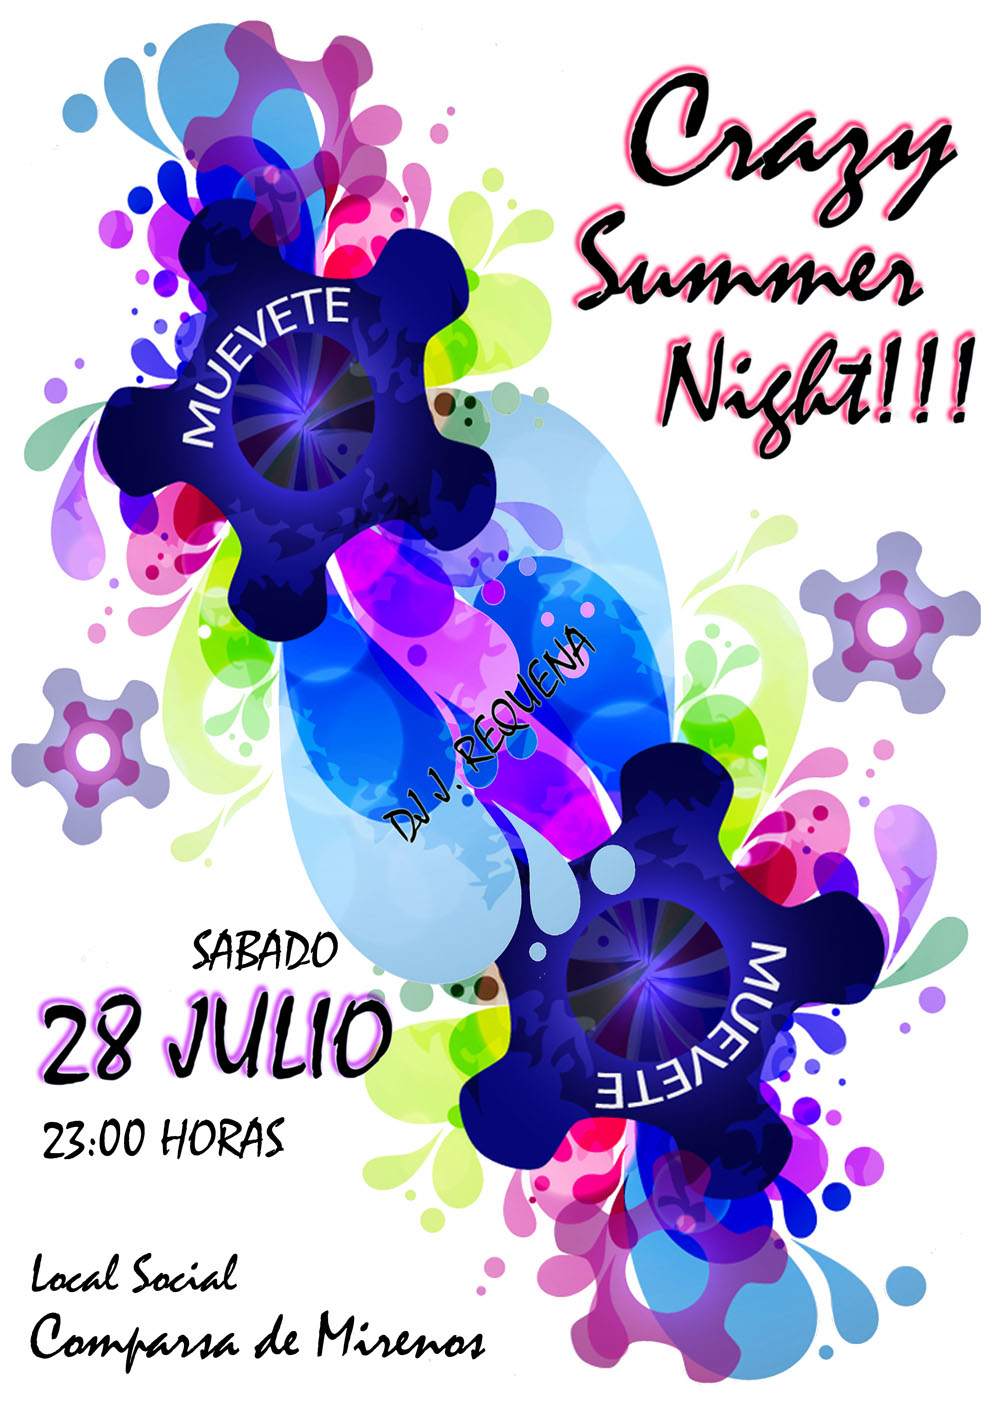 fiesta crazy summer night 28-12-2012